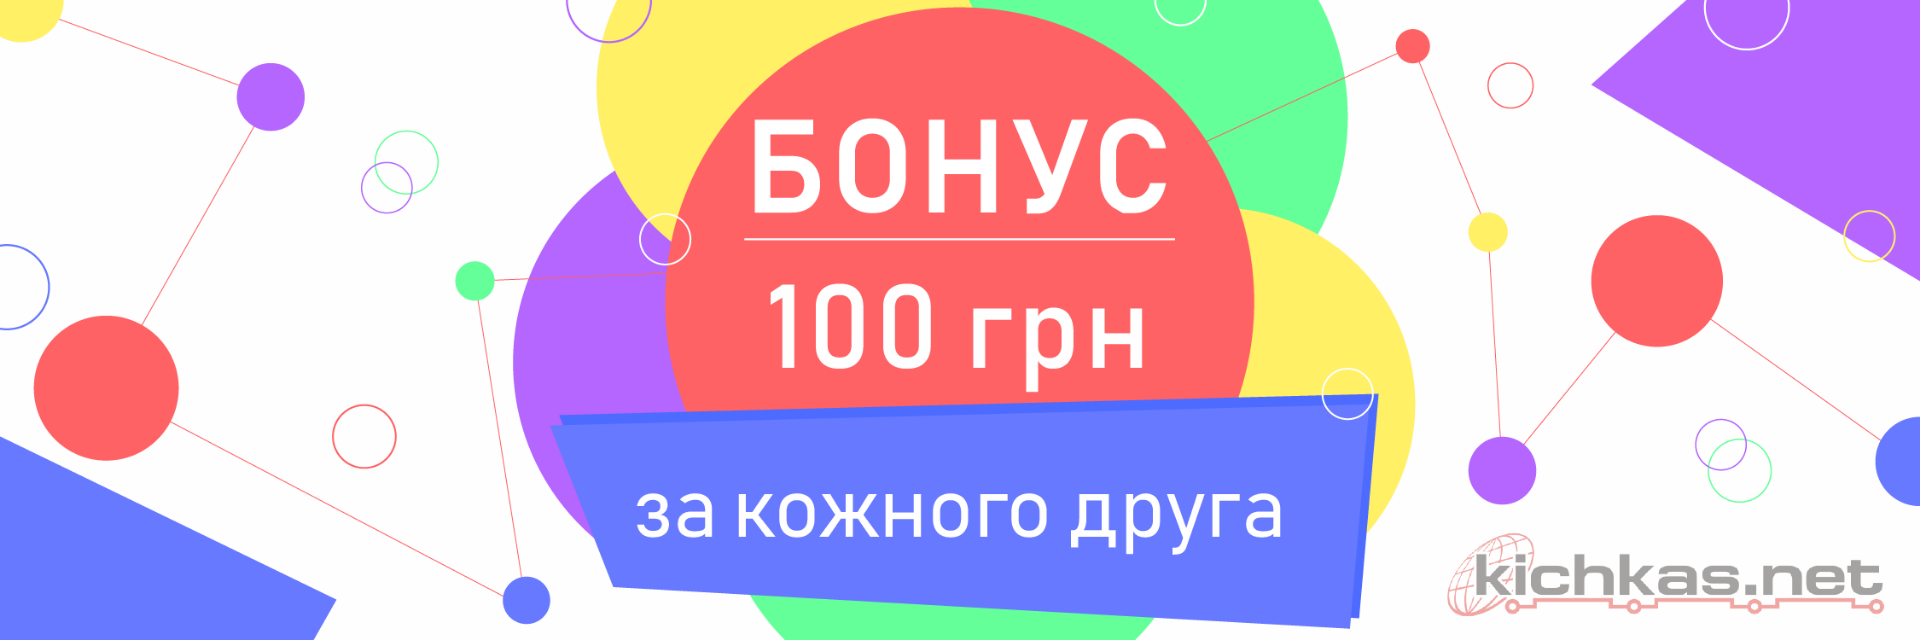 Приведи друга и получи 100 гривень